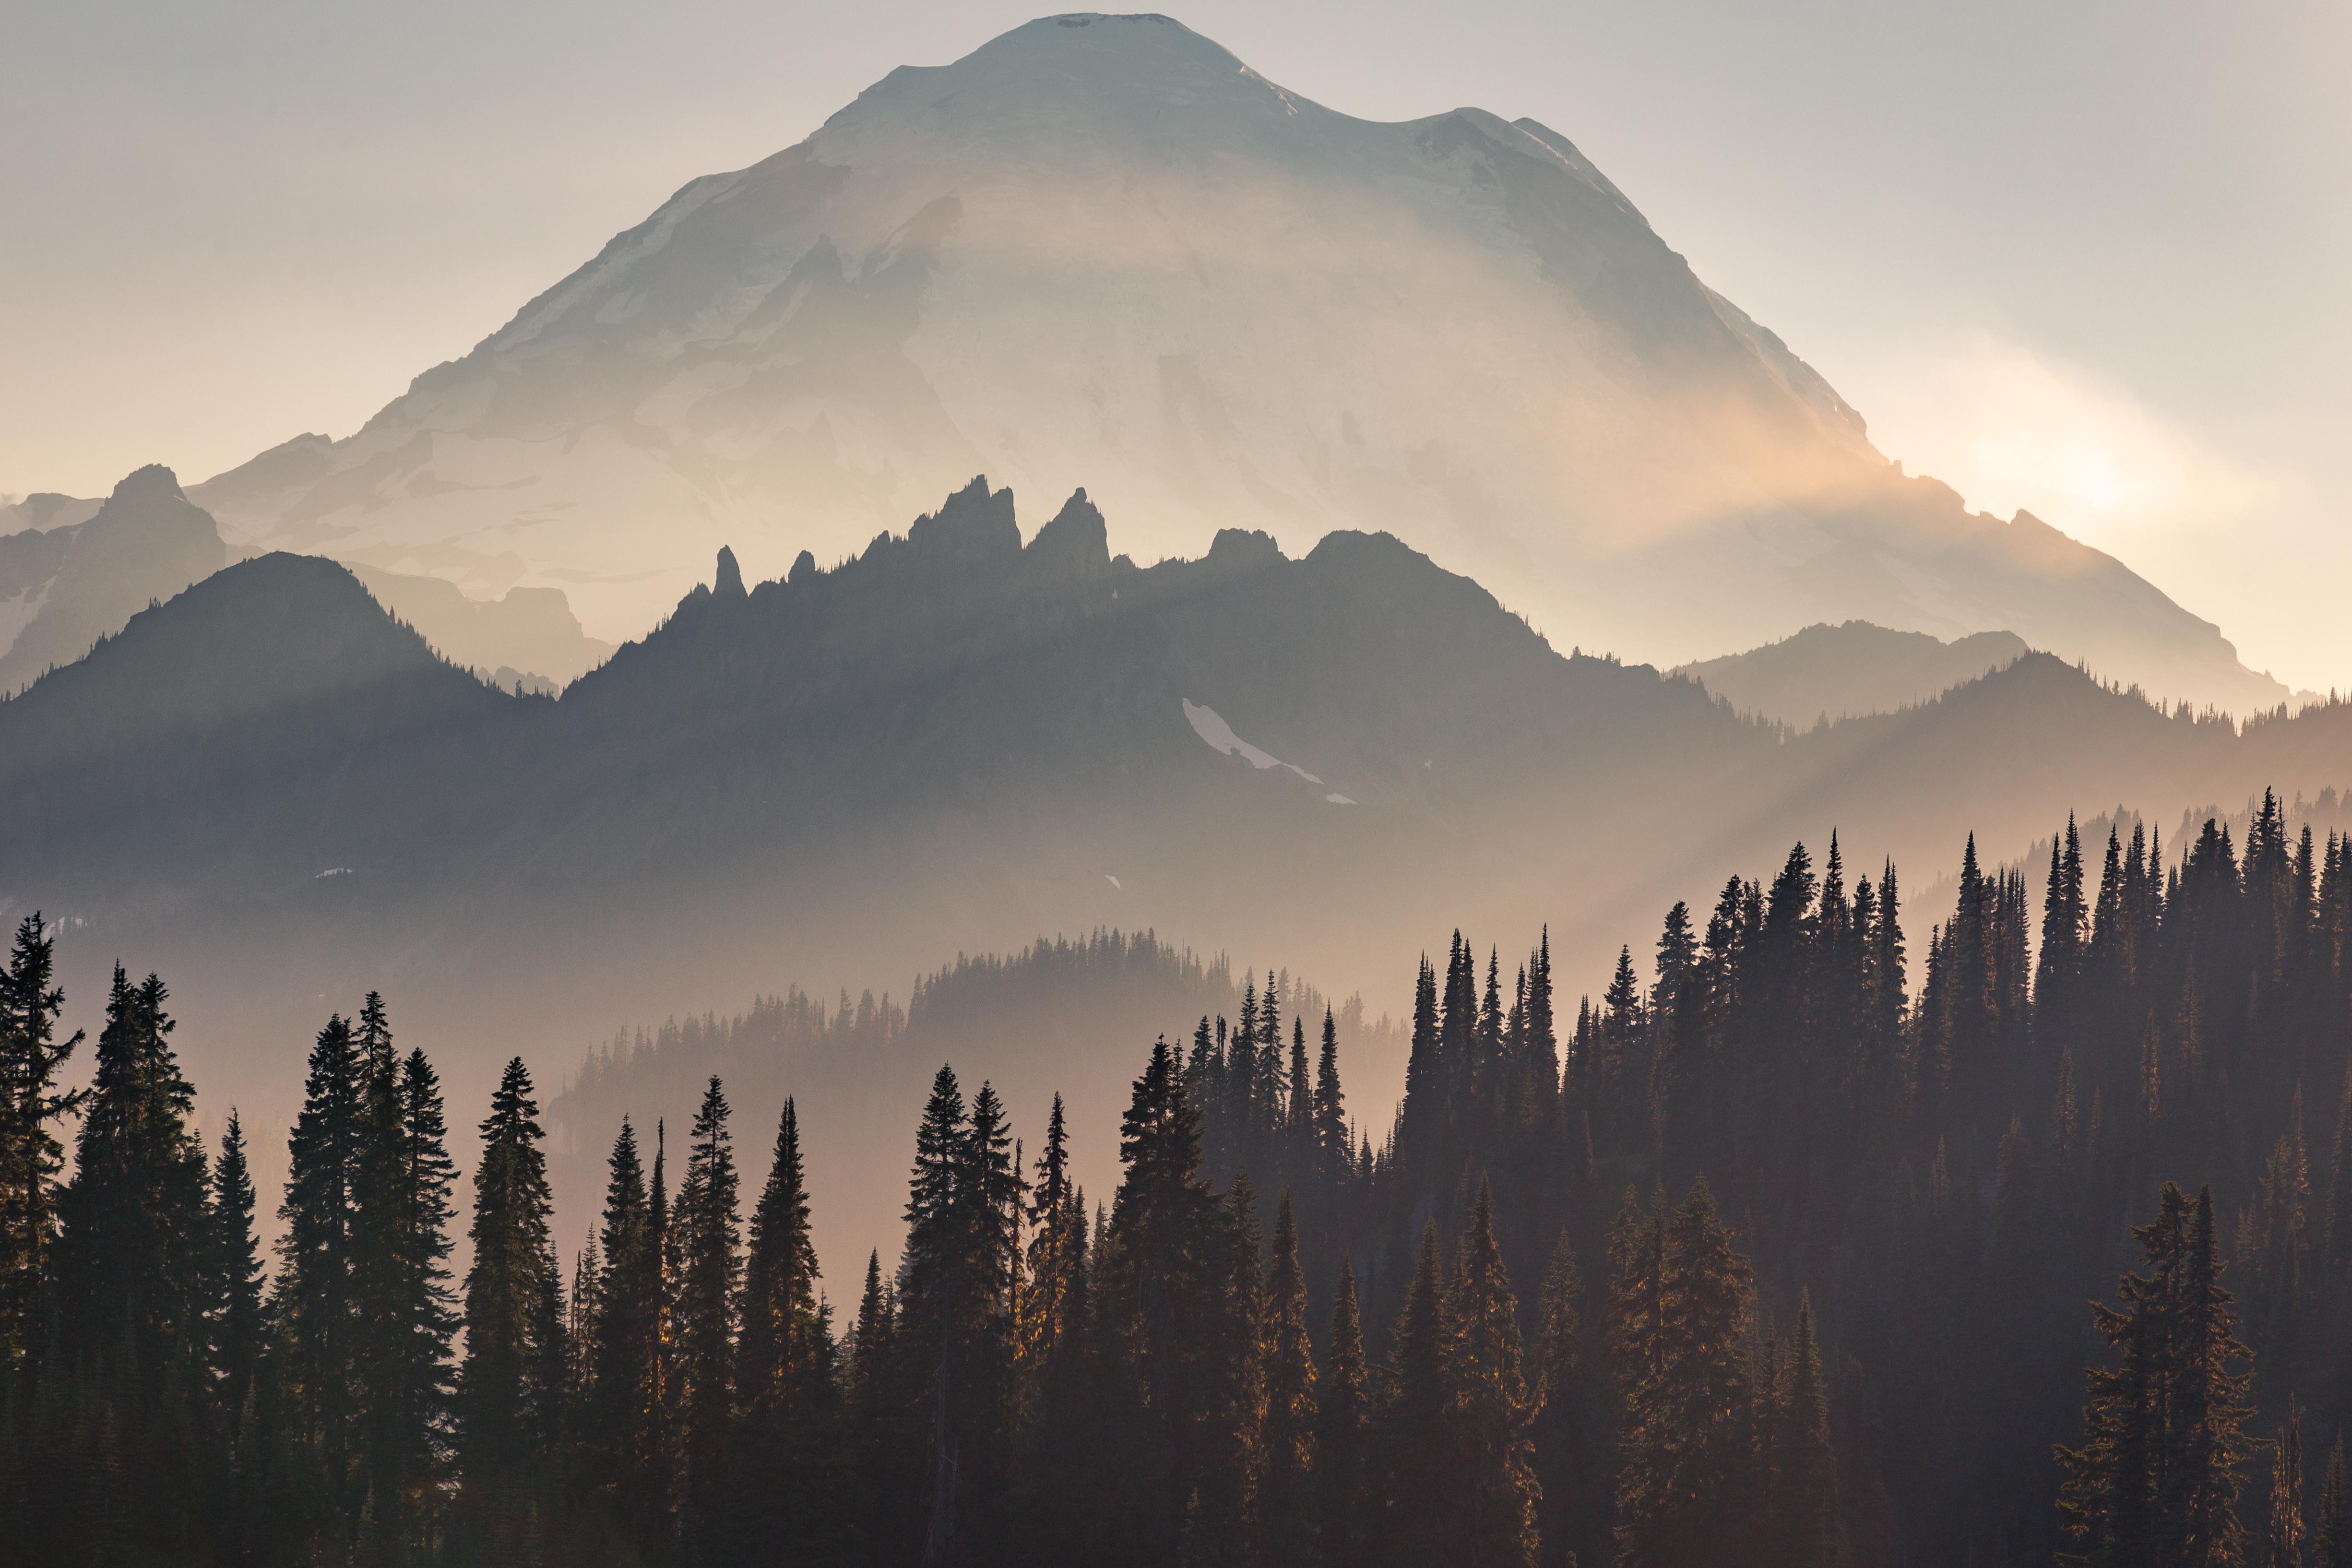 mount rainier sun beams 4k 1615197744 - Mount Rainier Sun Beams 4k - Mount Rainier Sun Beams 4k wallpapers